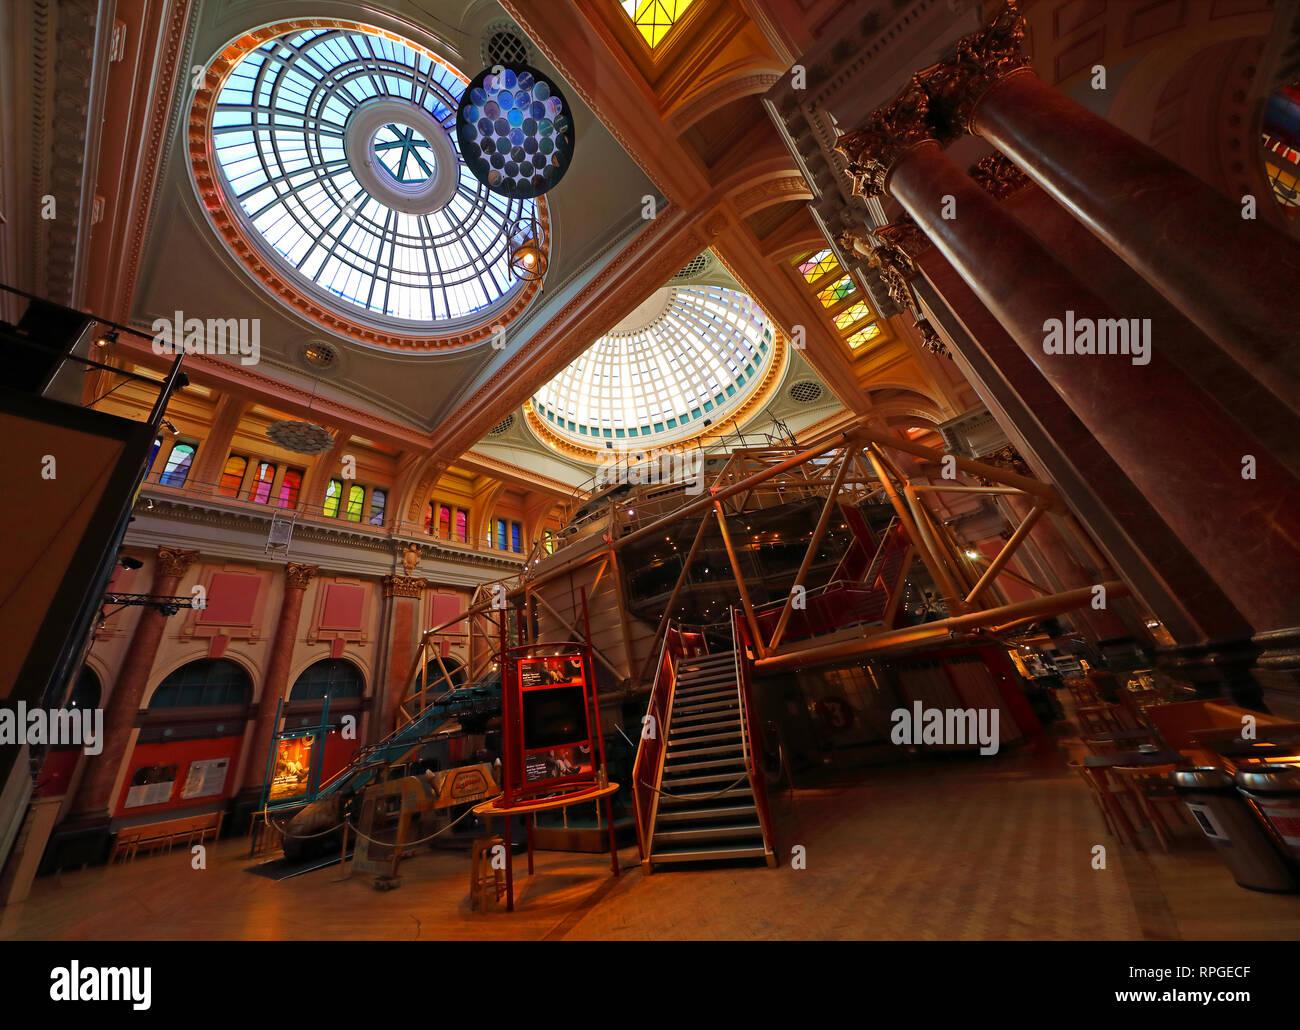 Royal Exchange Theatre, St Anns Sq, Manchester, Angleterre, Royaume-Uni, M2 7DH Banque D'Images